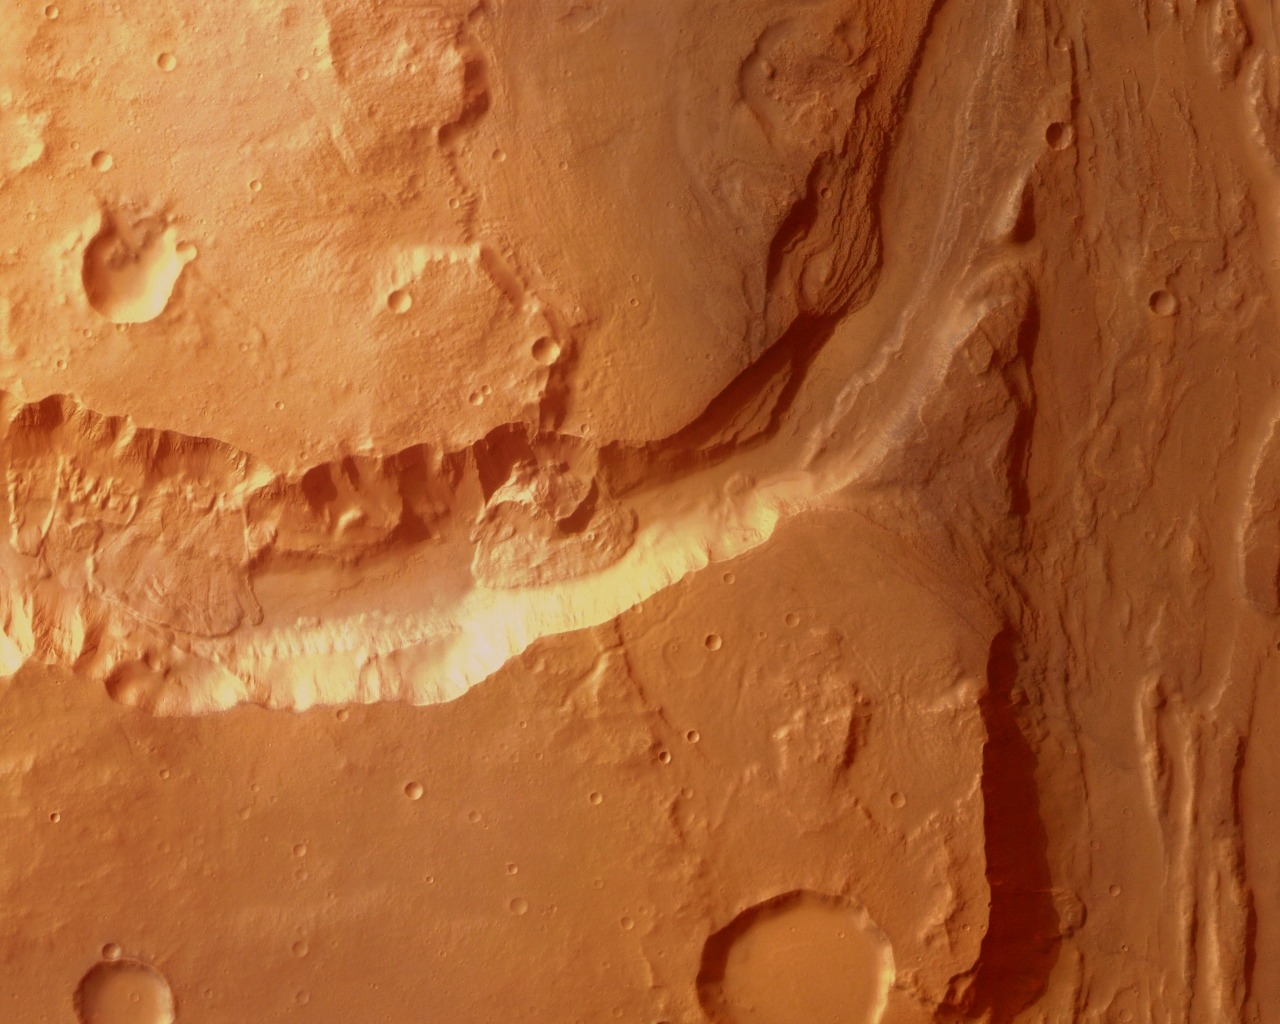 1567219038736-AresVallis-detail-wallpaper.jpg